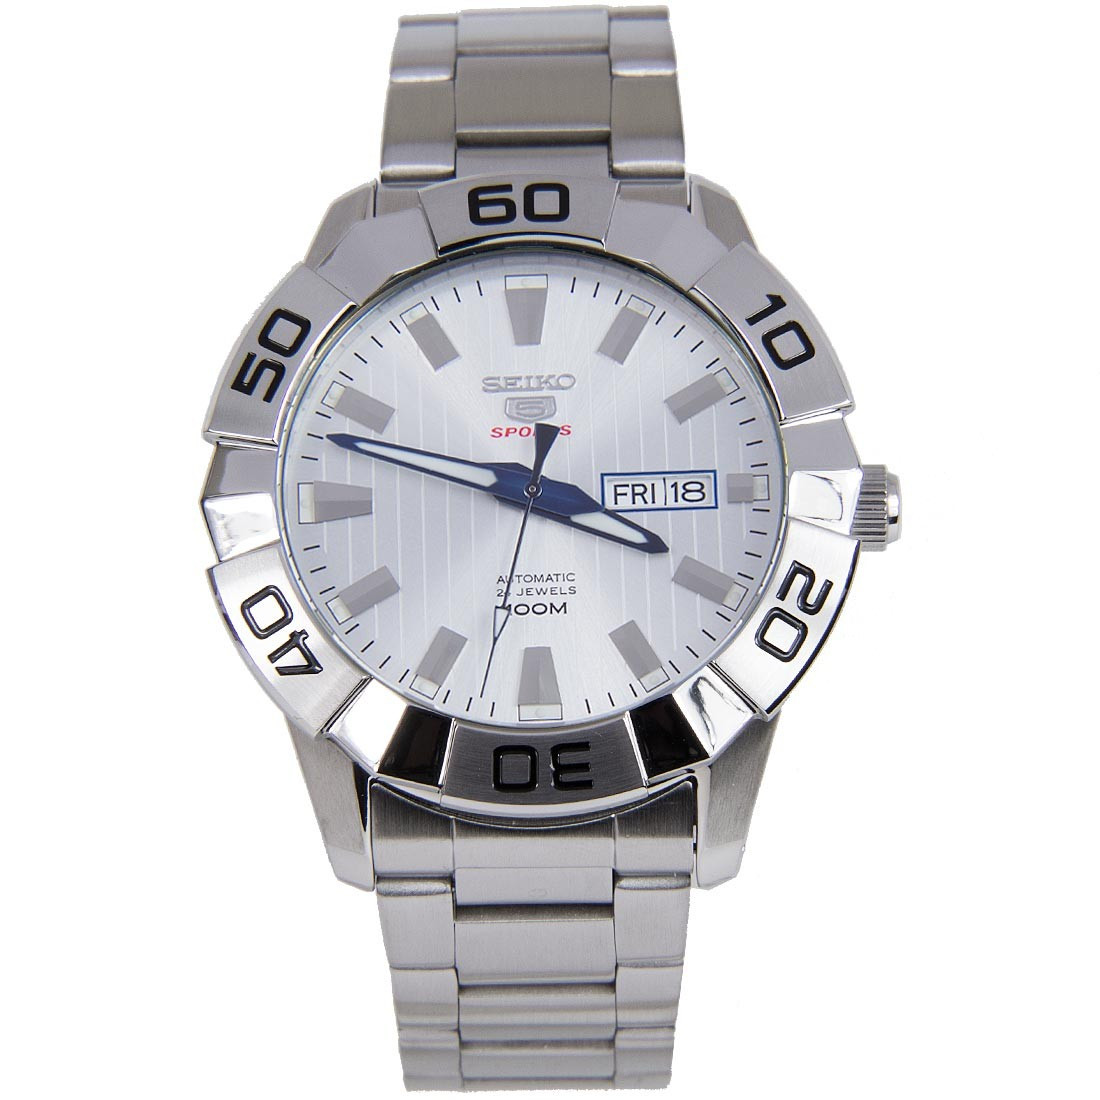 Часы Seiko 5 Sports SRPA49K1 Automatic 4R36